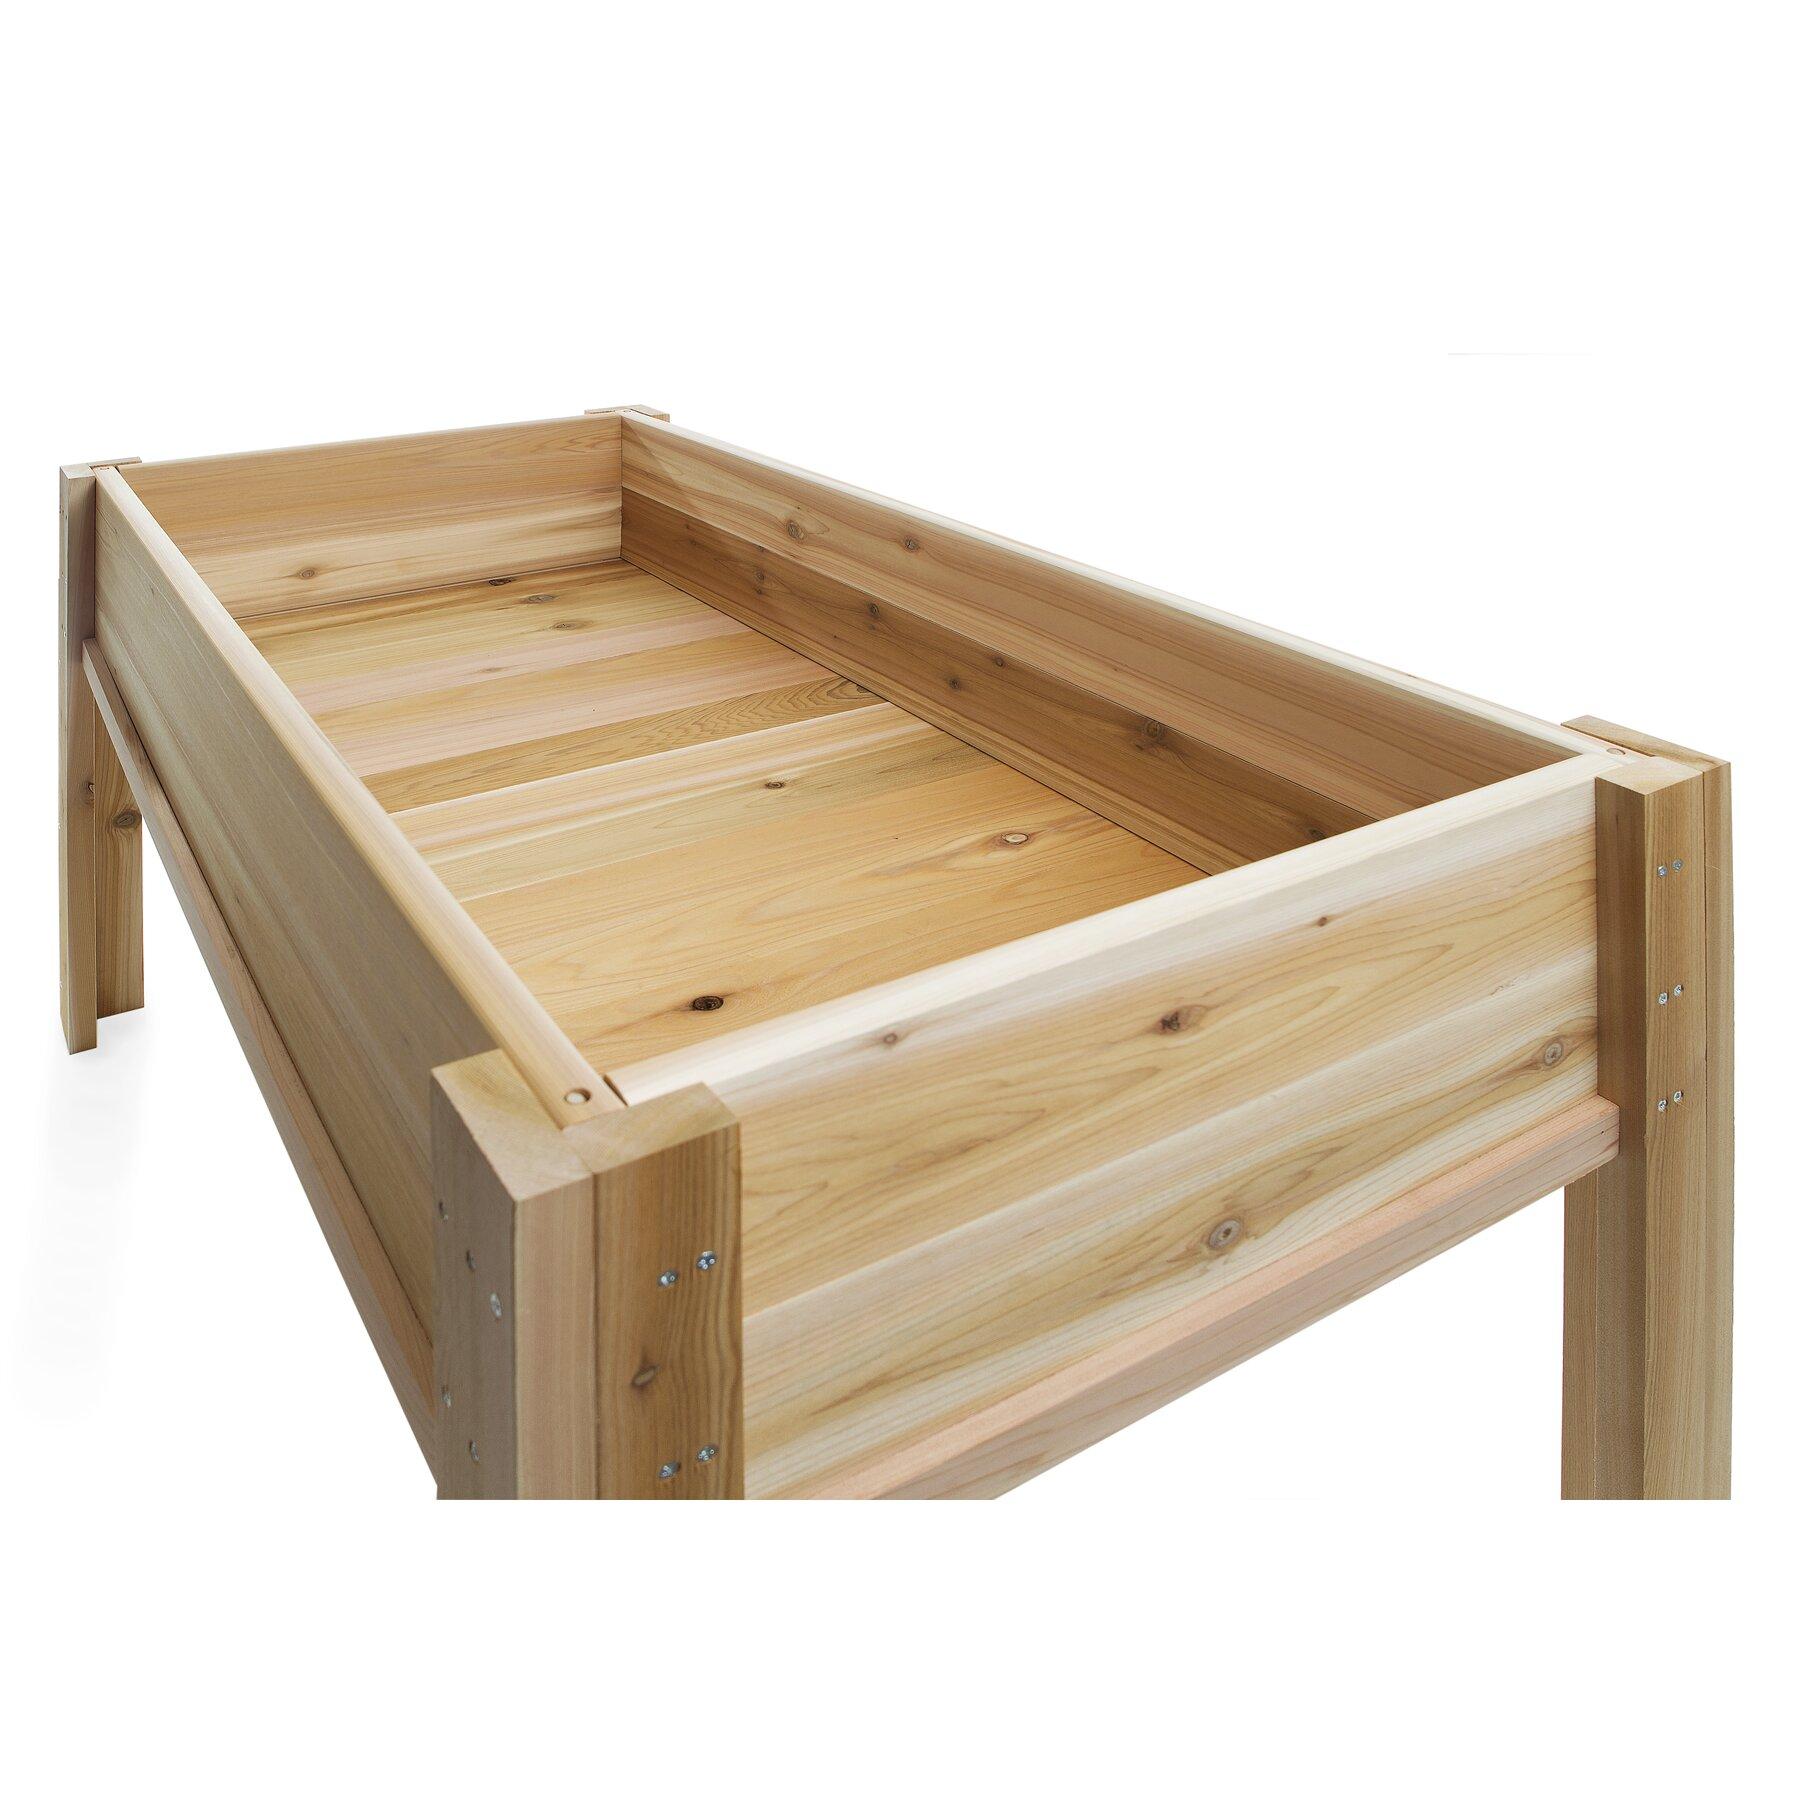 4 Ft Raised Garden Box With Legs Wayfair